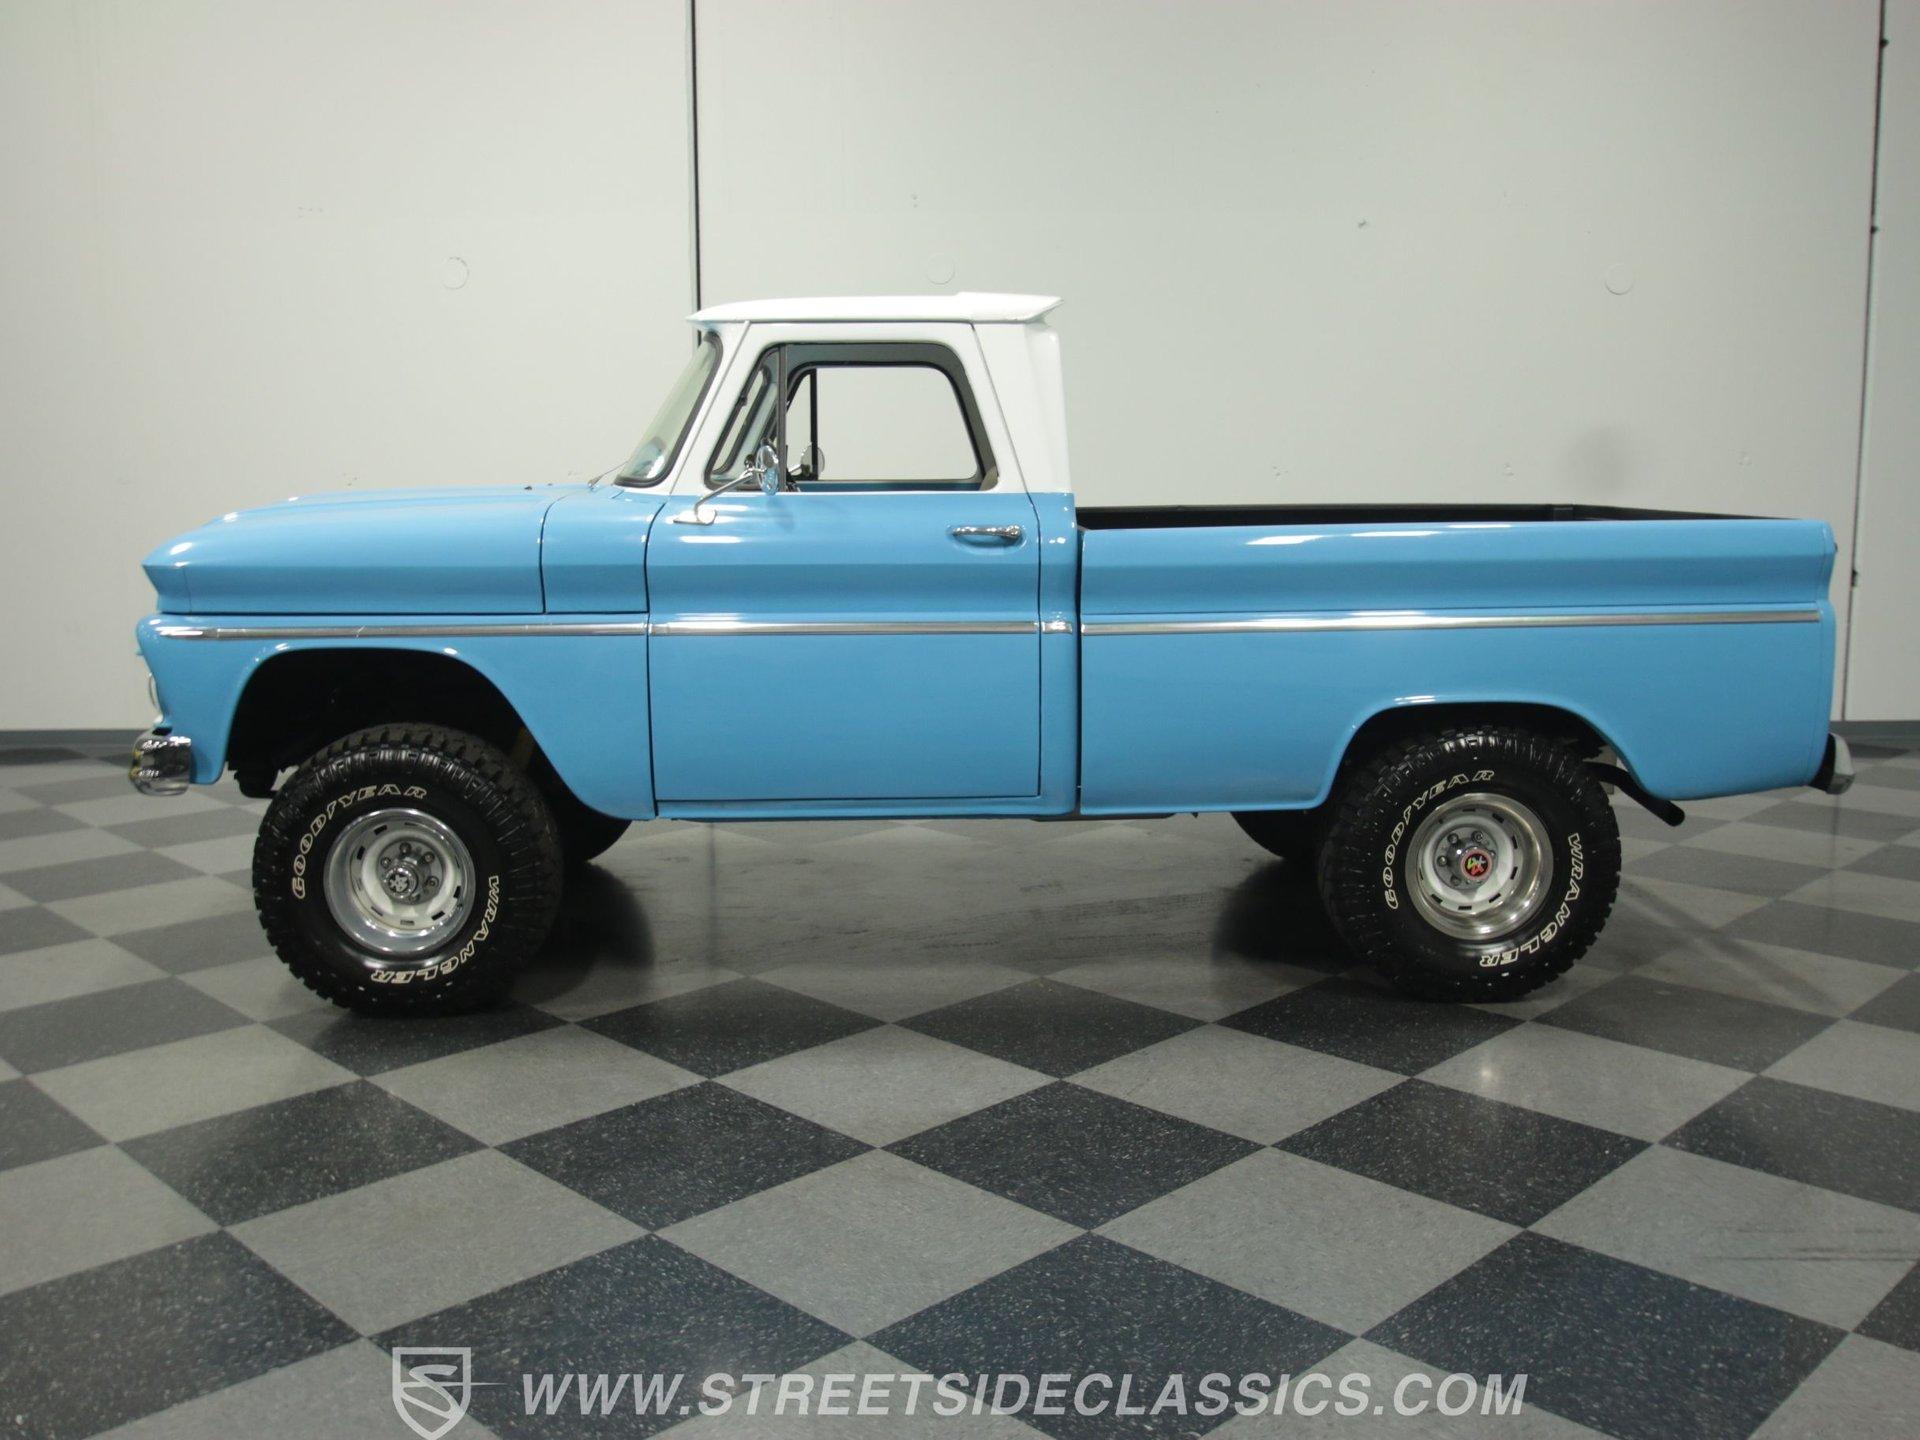 1965 gmc c10 4x4